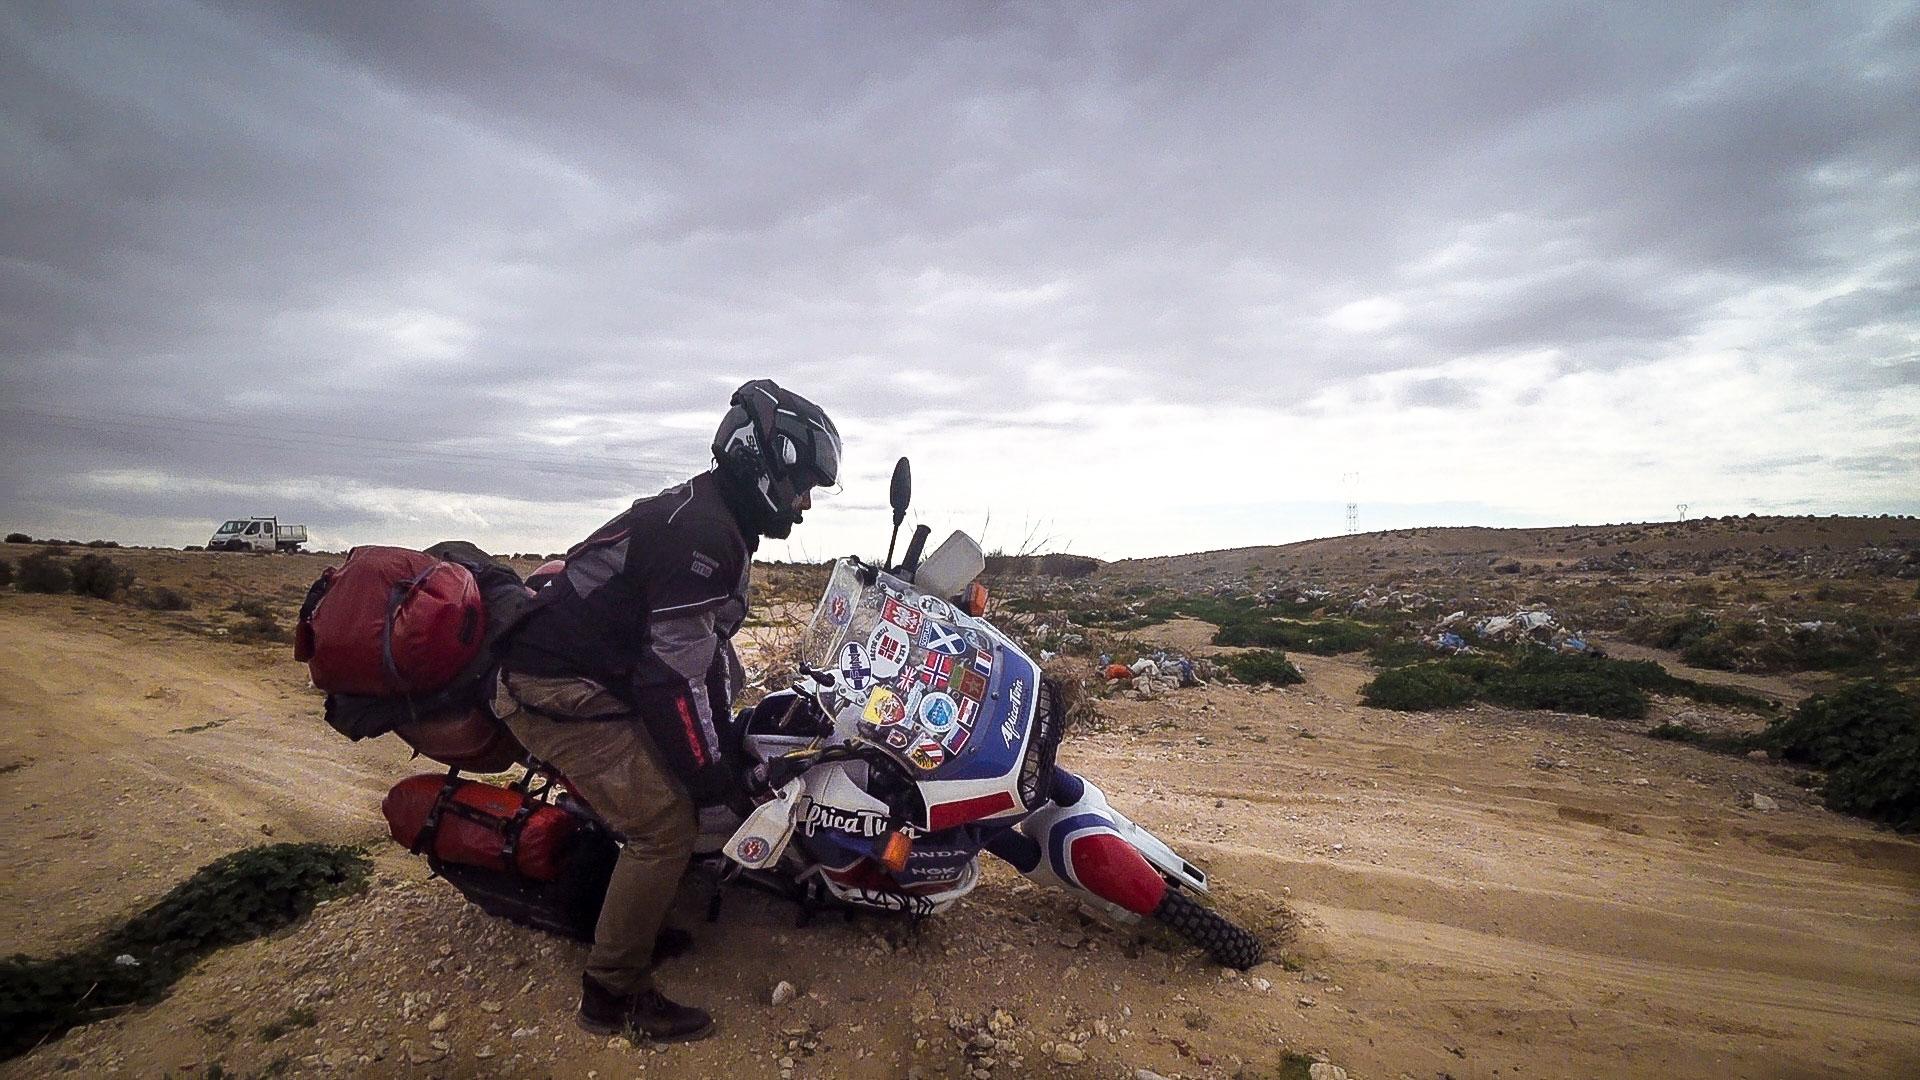 caduta moto deserto tunisia